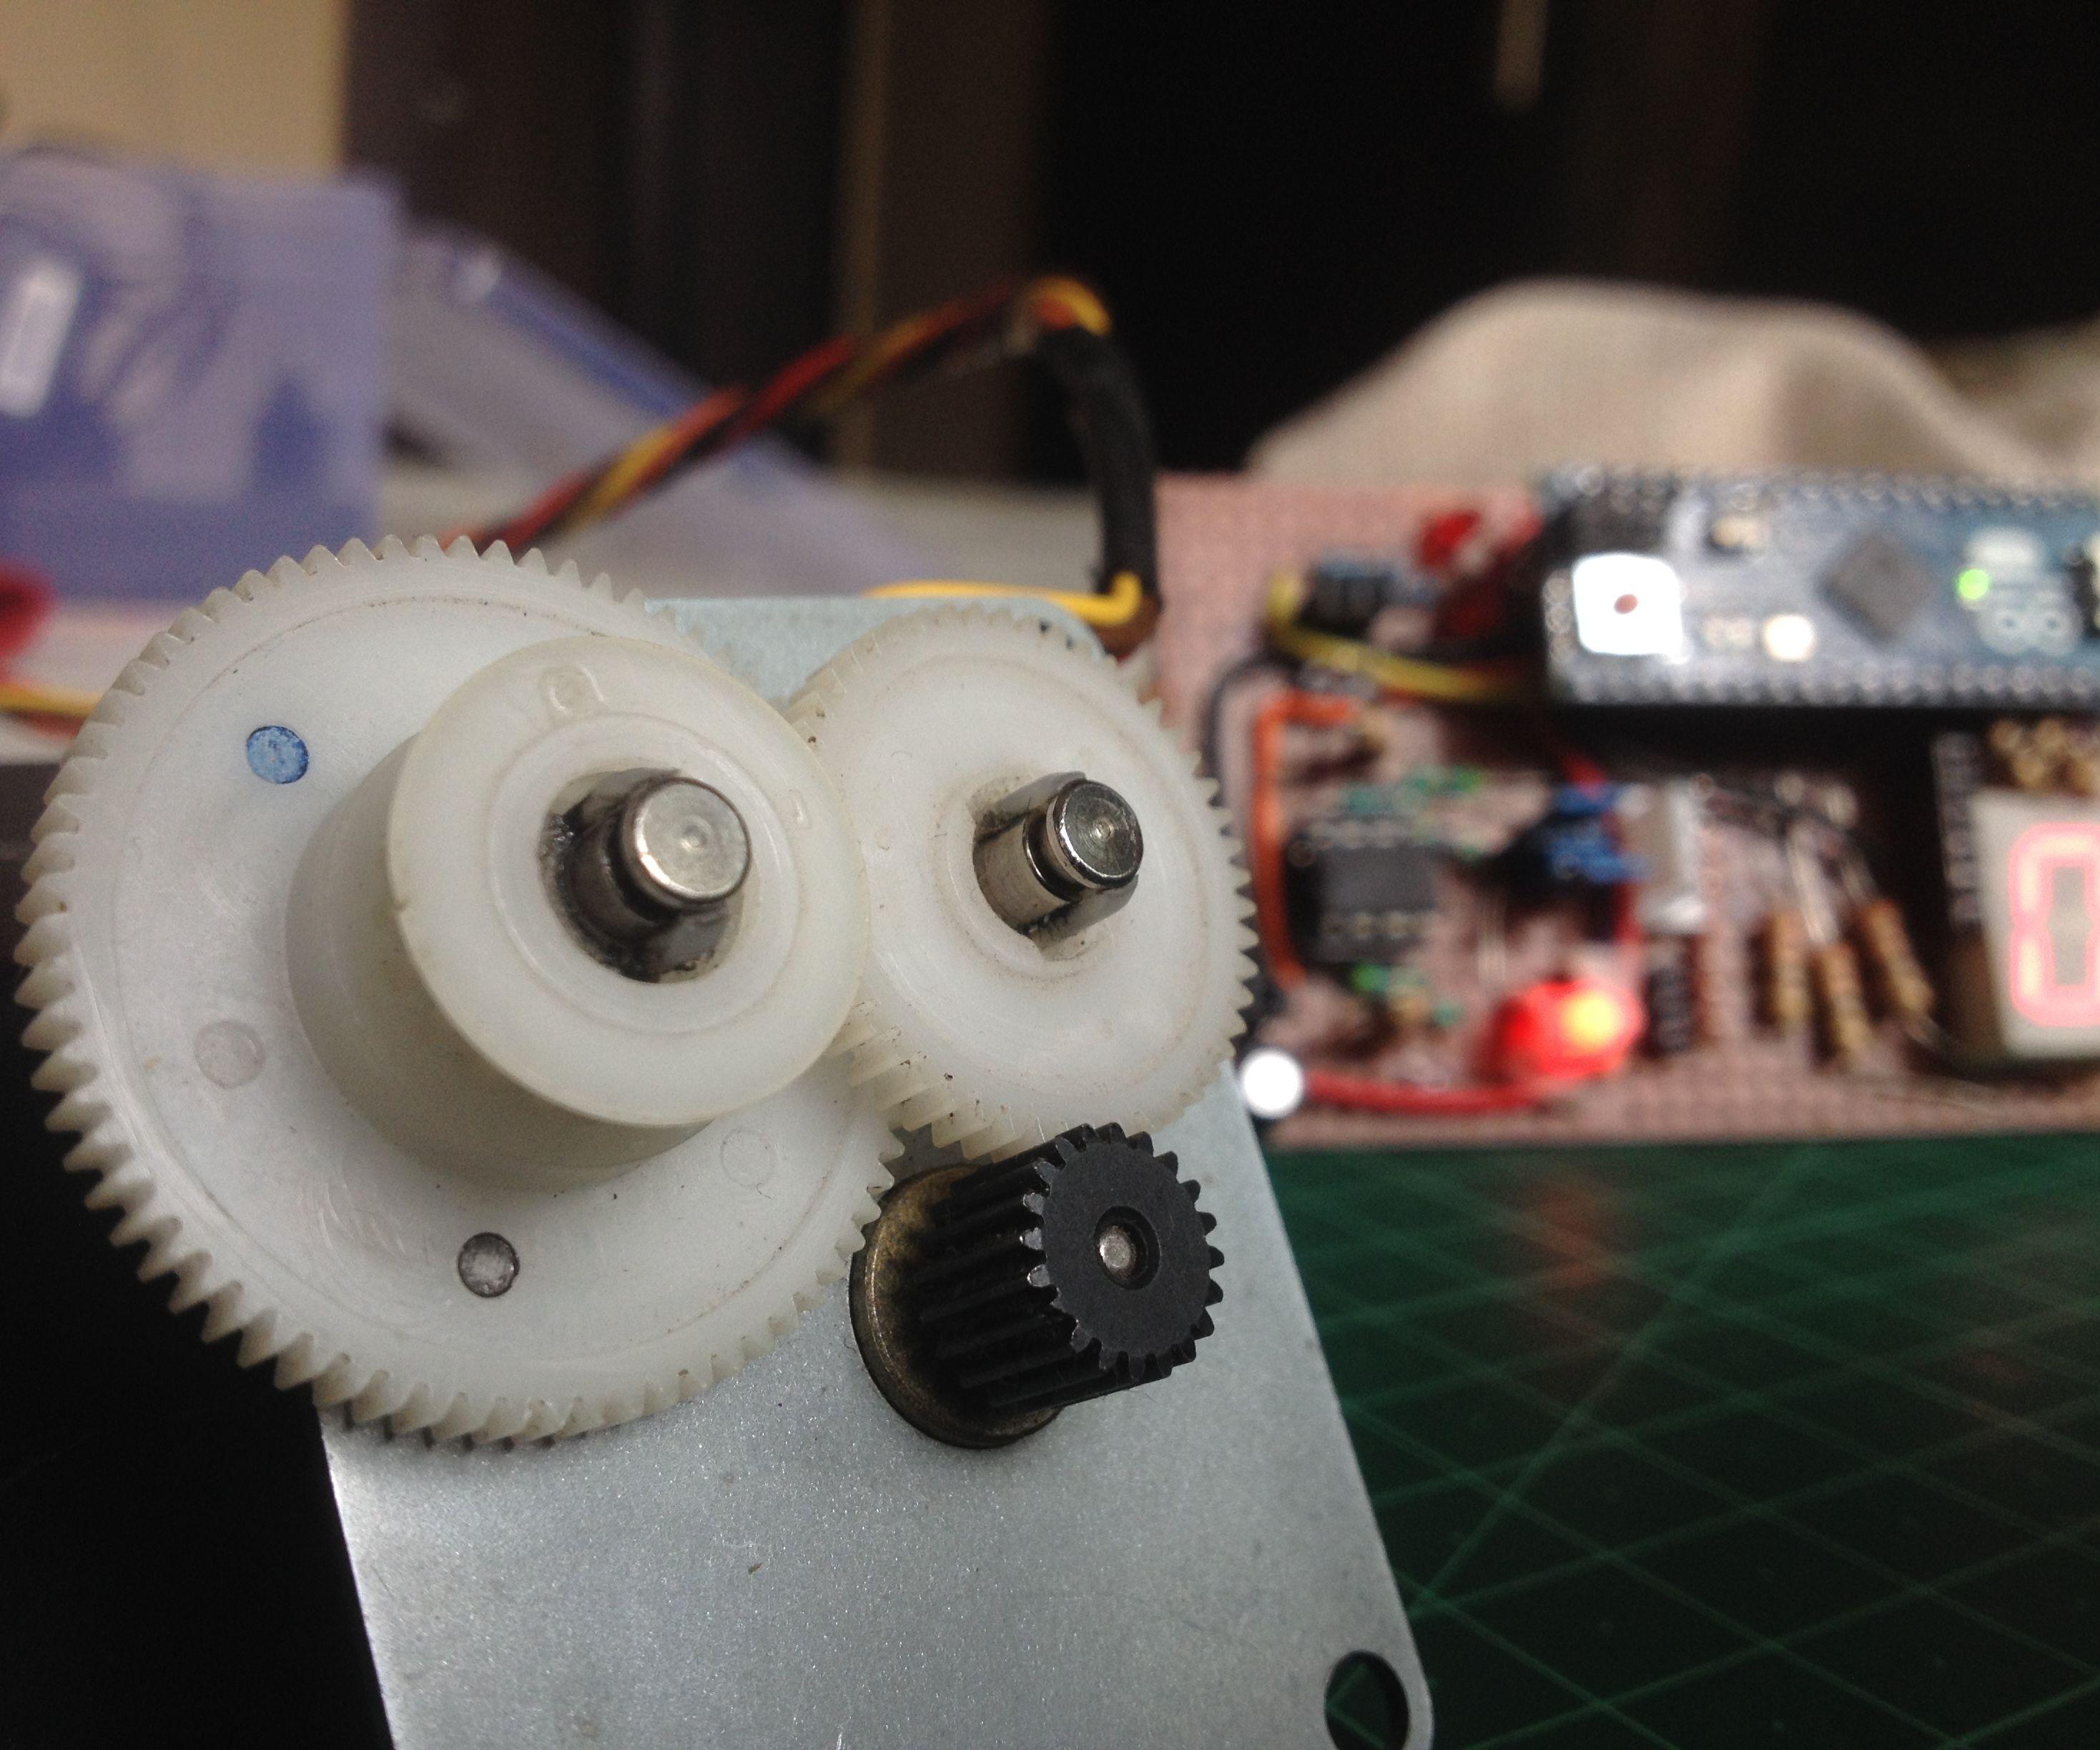 Use a Stepper Motor As a Rotary Encoder